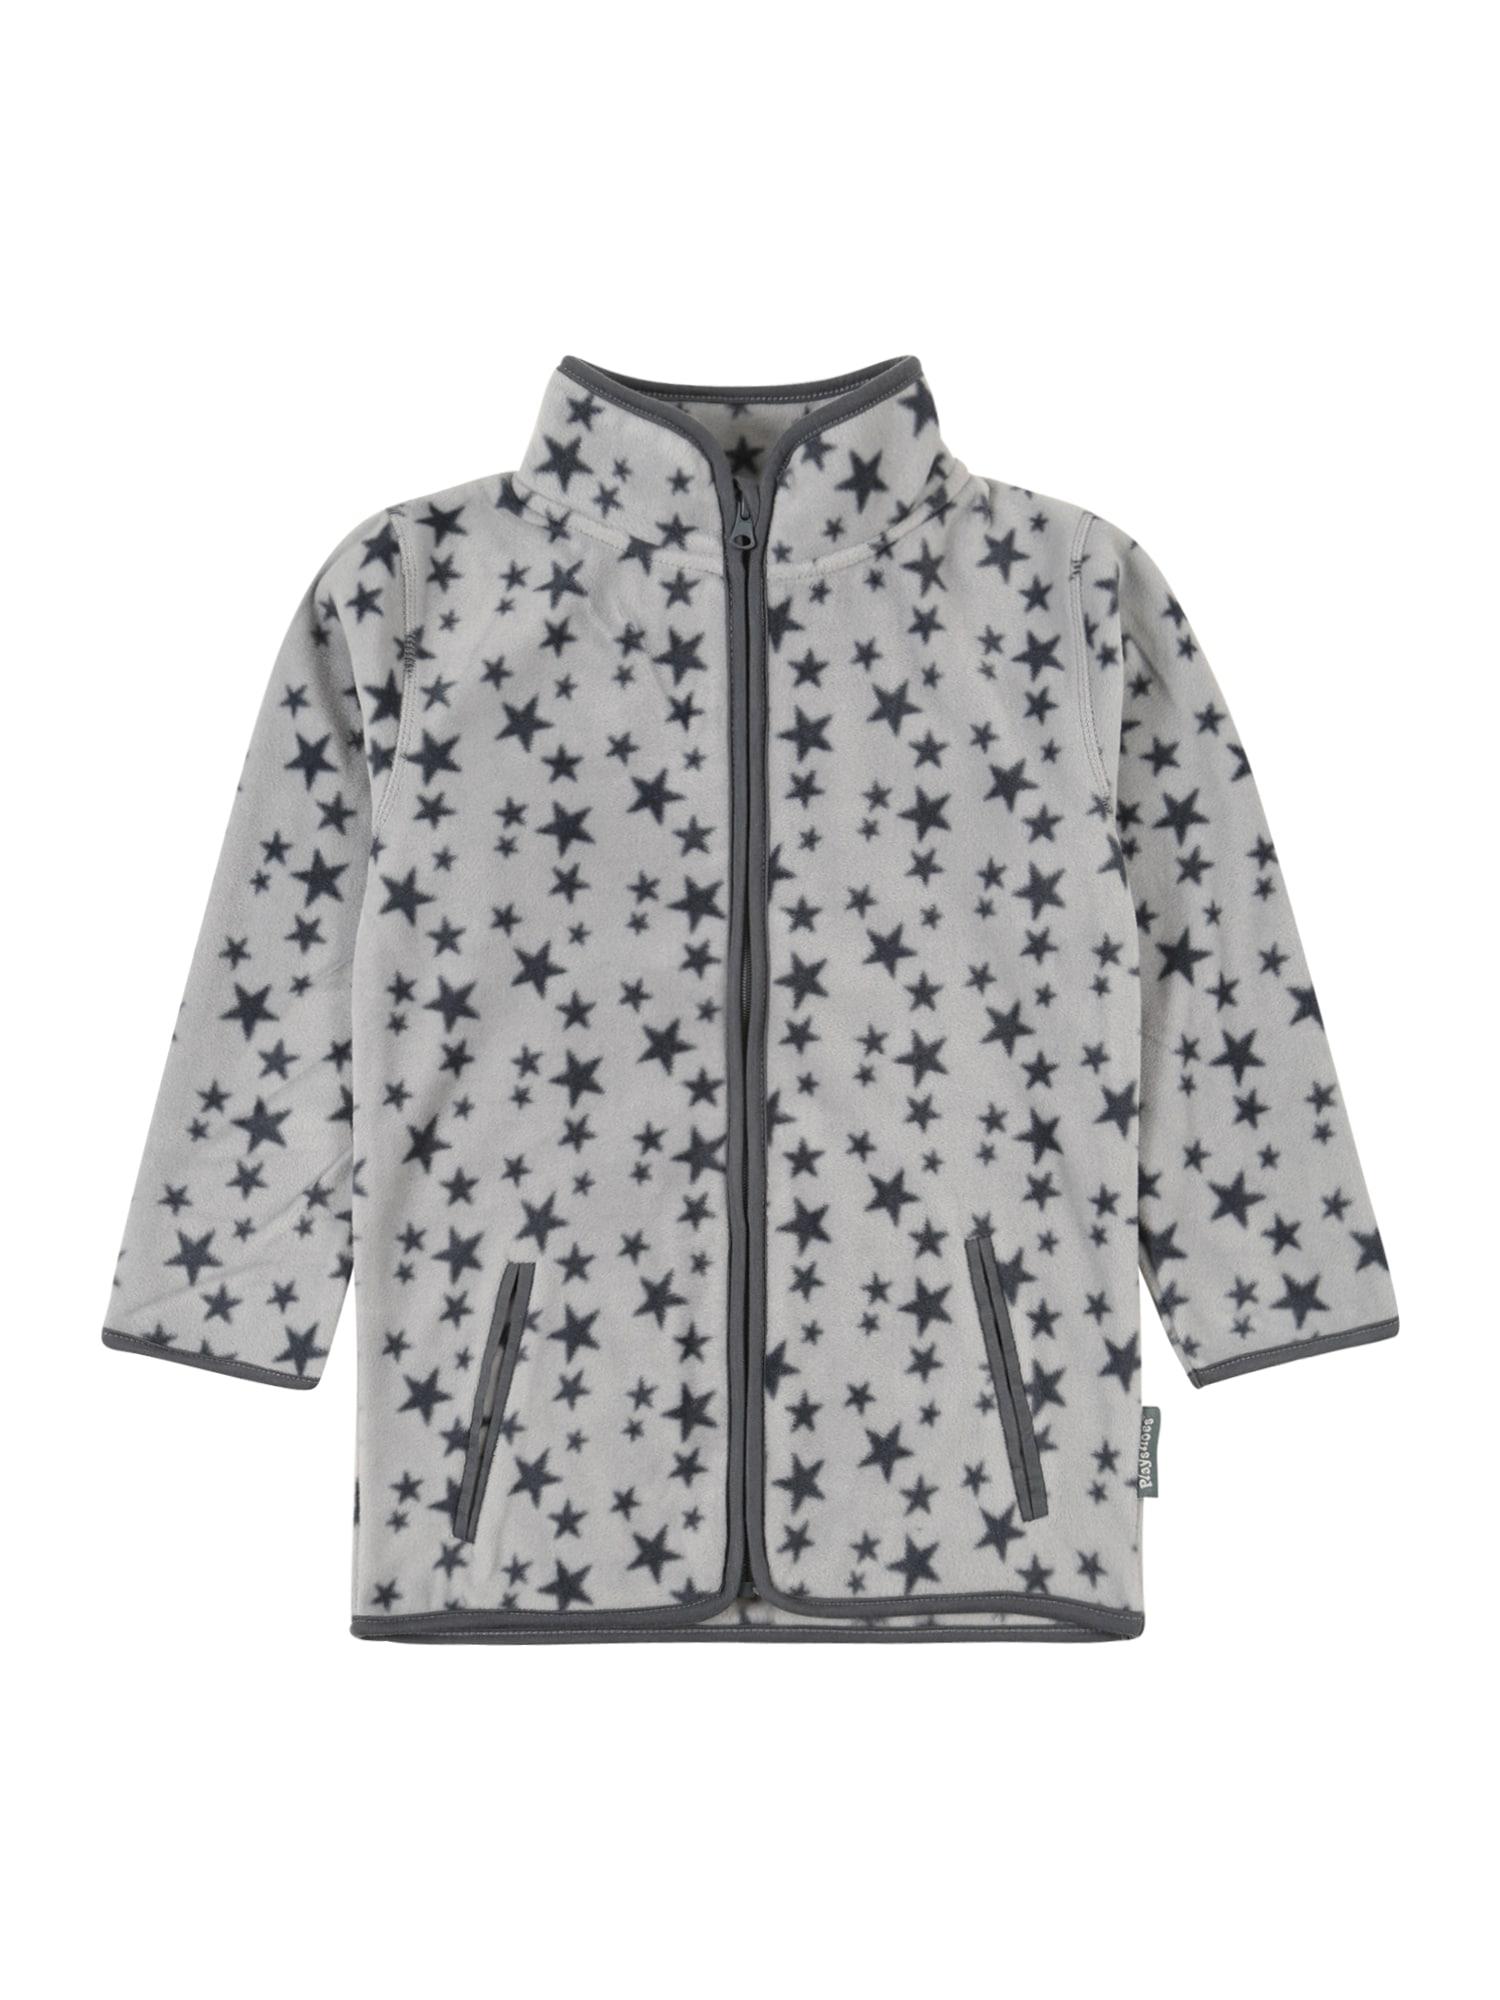 PLAYSHOES Flisinis džemperis pilka / tamsiai pilka